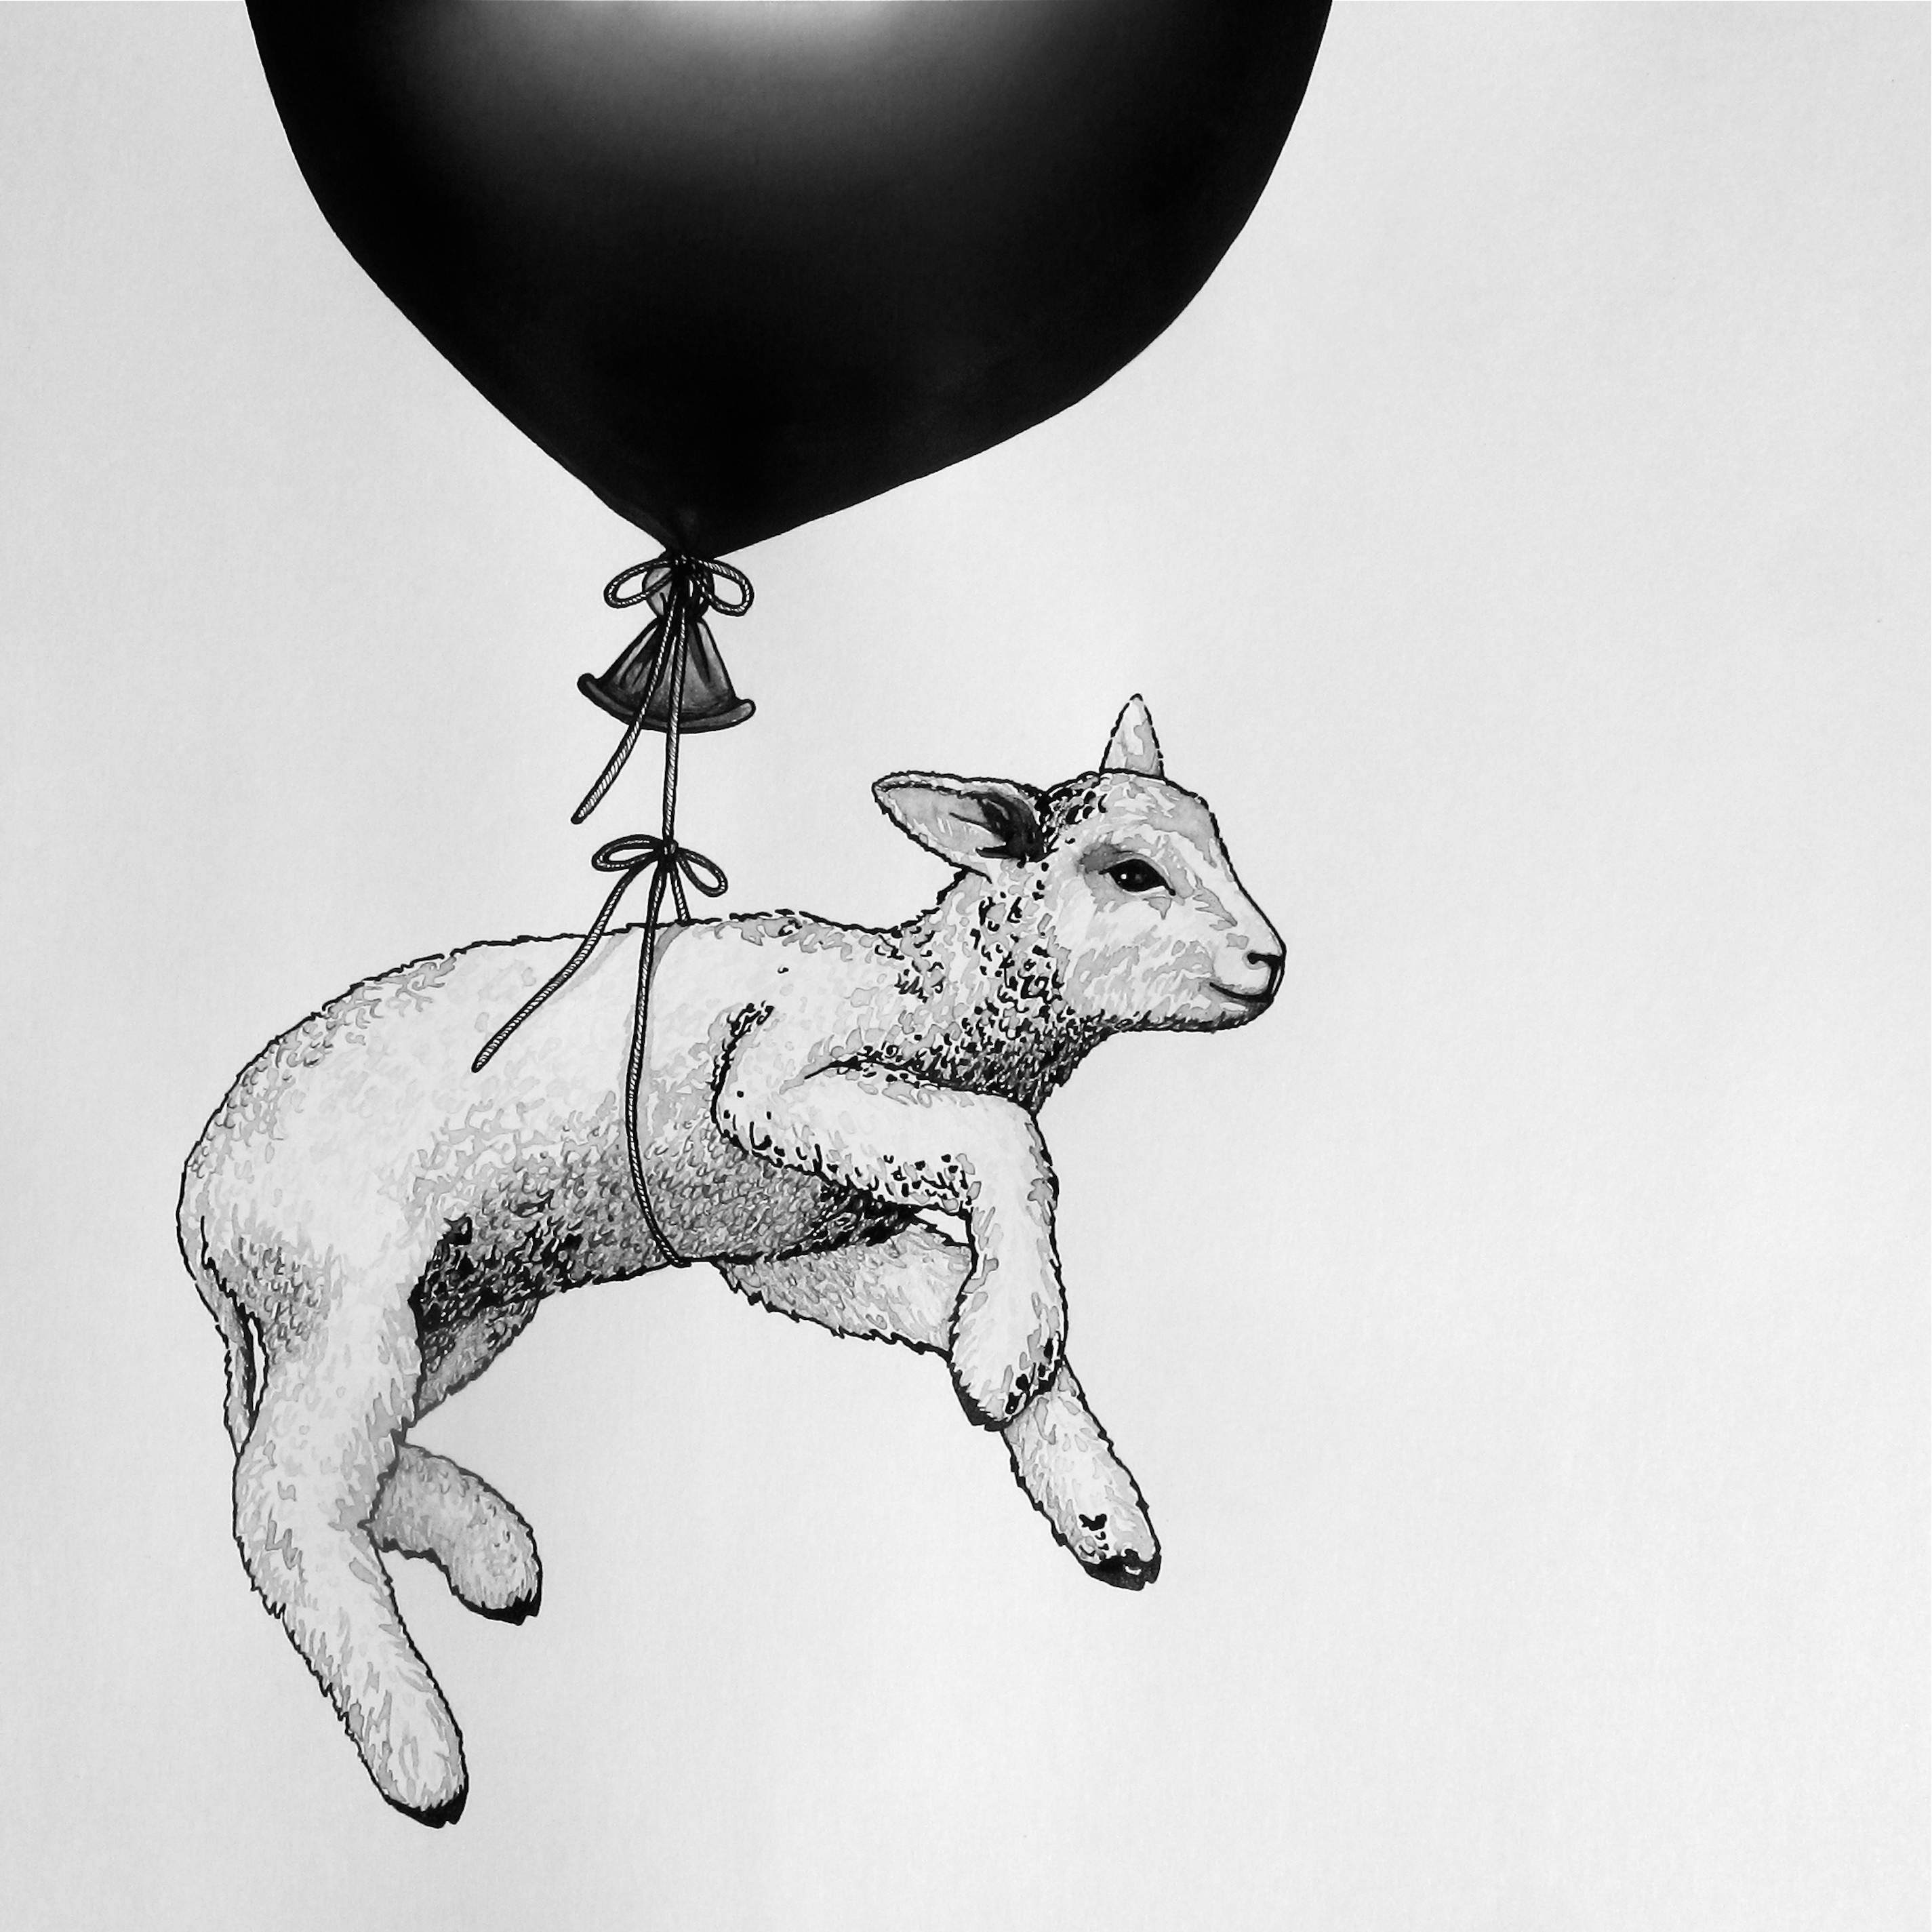 A Lone Cloudburst (LP Teaser)